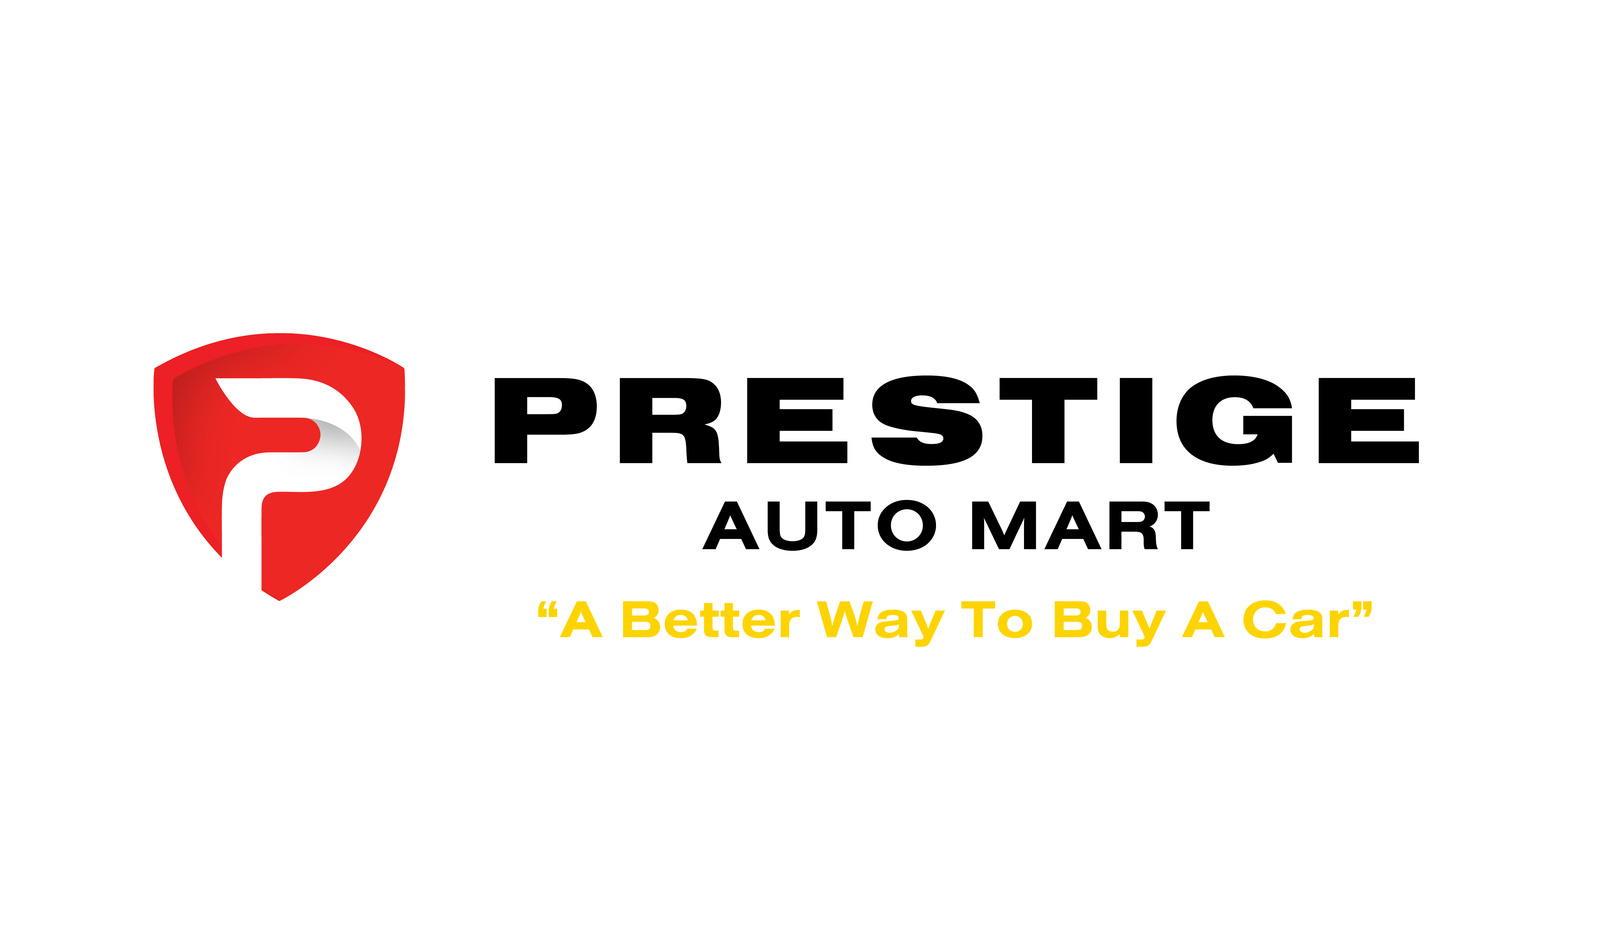 Fiat Of Providence >> Prestige Auto Mart 1, Inc. - Westport, MA: Read Consumer ...